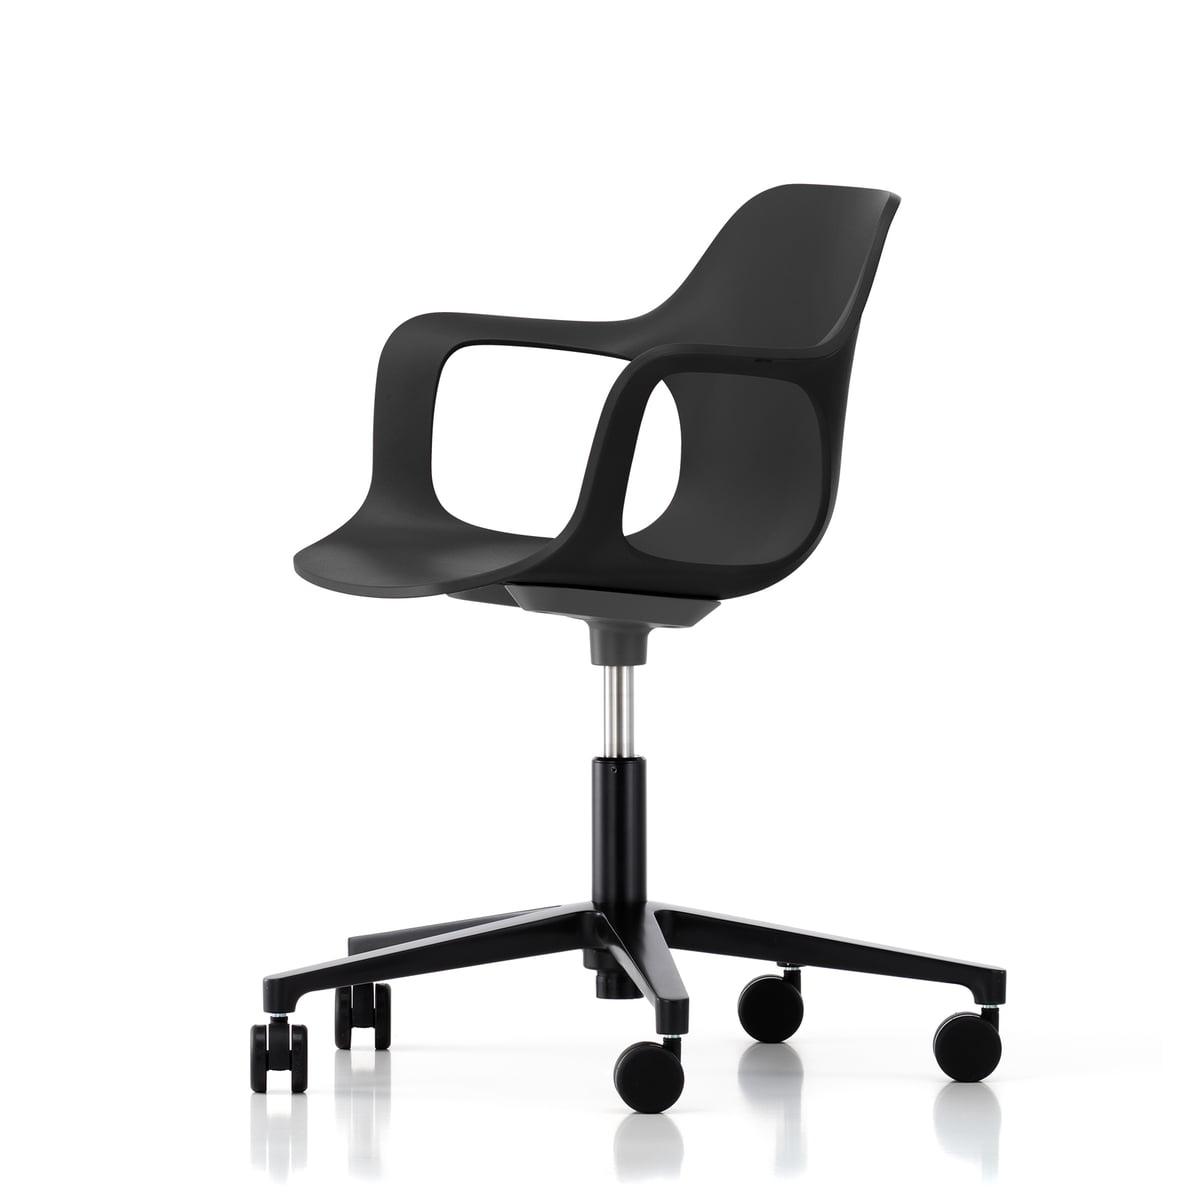 Hal Studio Office Swivel Chair By Vitra